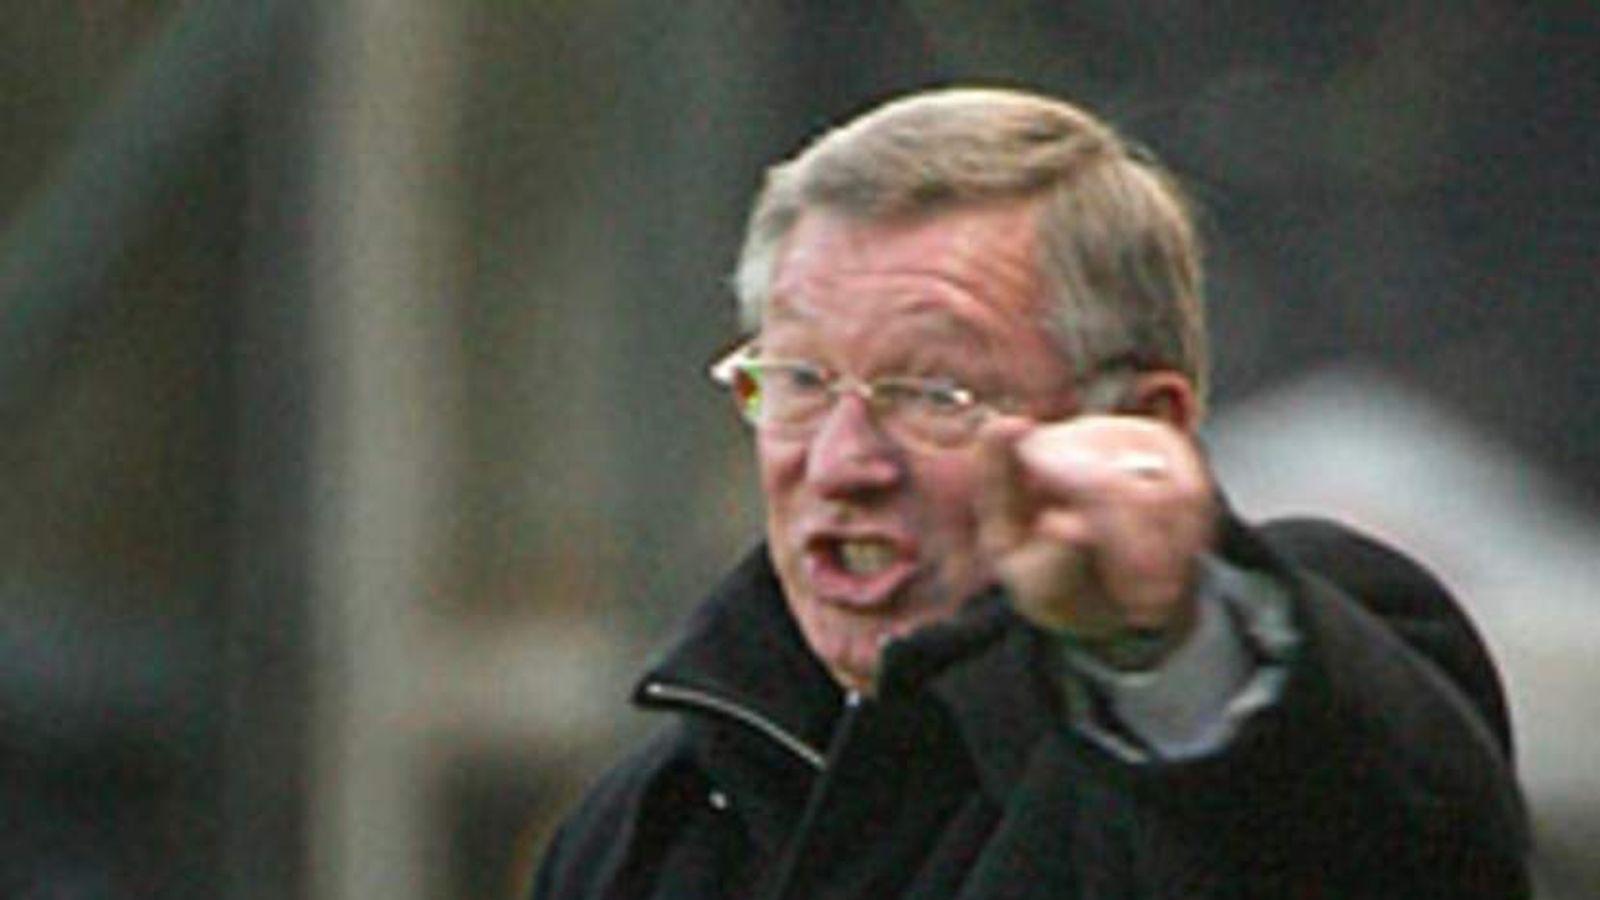 95 Sir Alex Ferguson ranting shouting angry